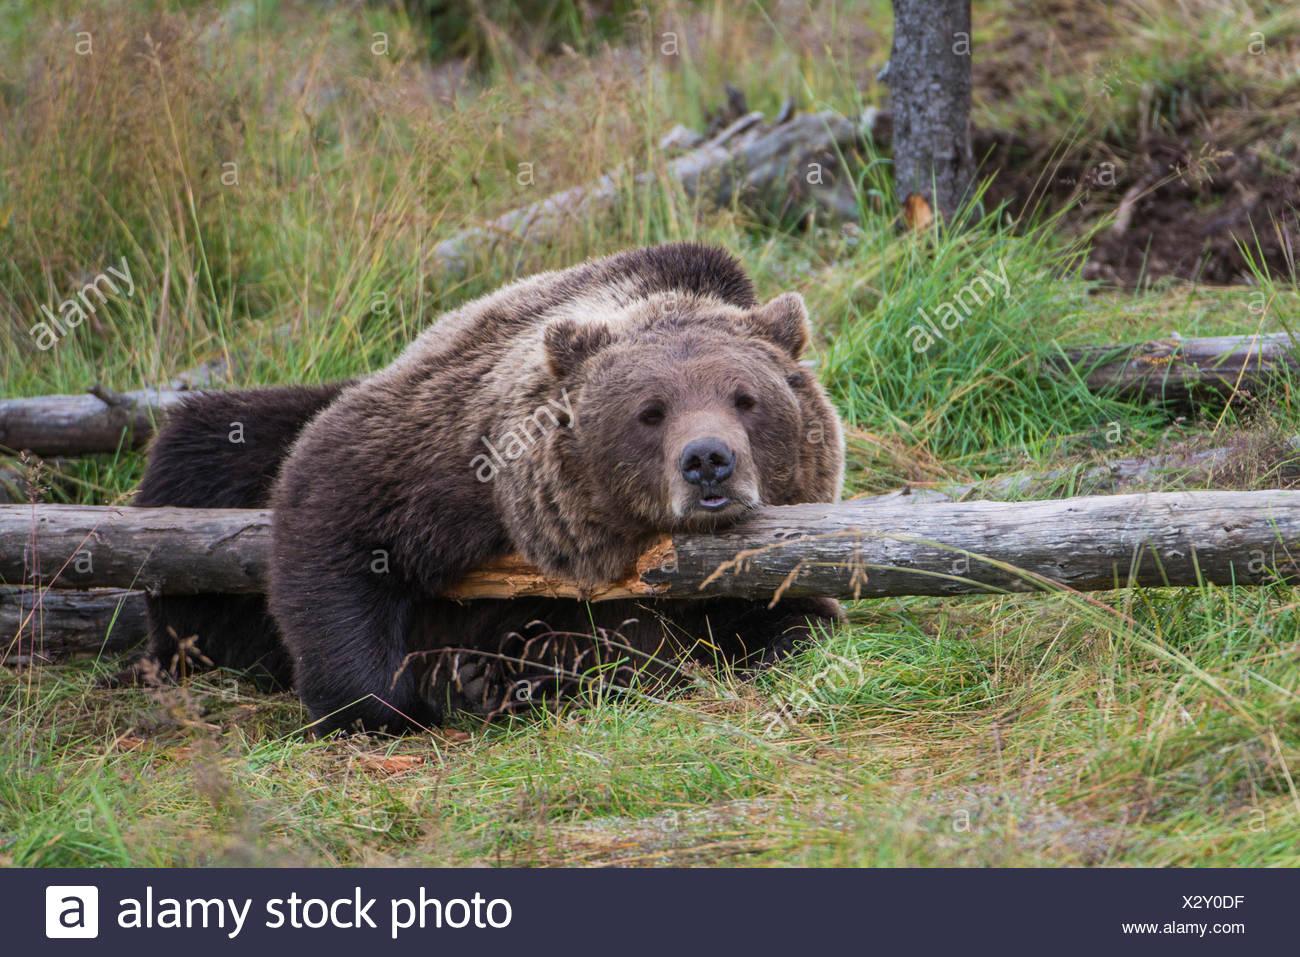 Brown bear (Ursus arctos) lying on a fallen tree trunk, Namsskogan Familienpark, Trones, Nord-Trøndelag, Trøndelag, Norway Stock Photo